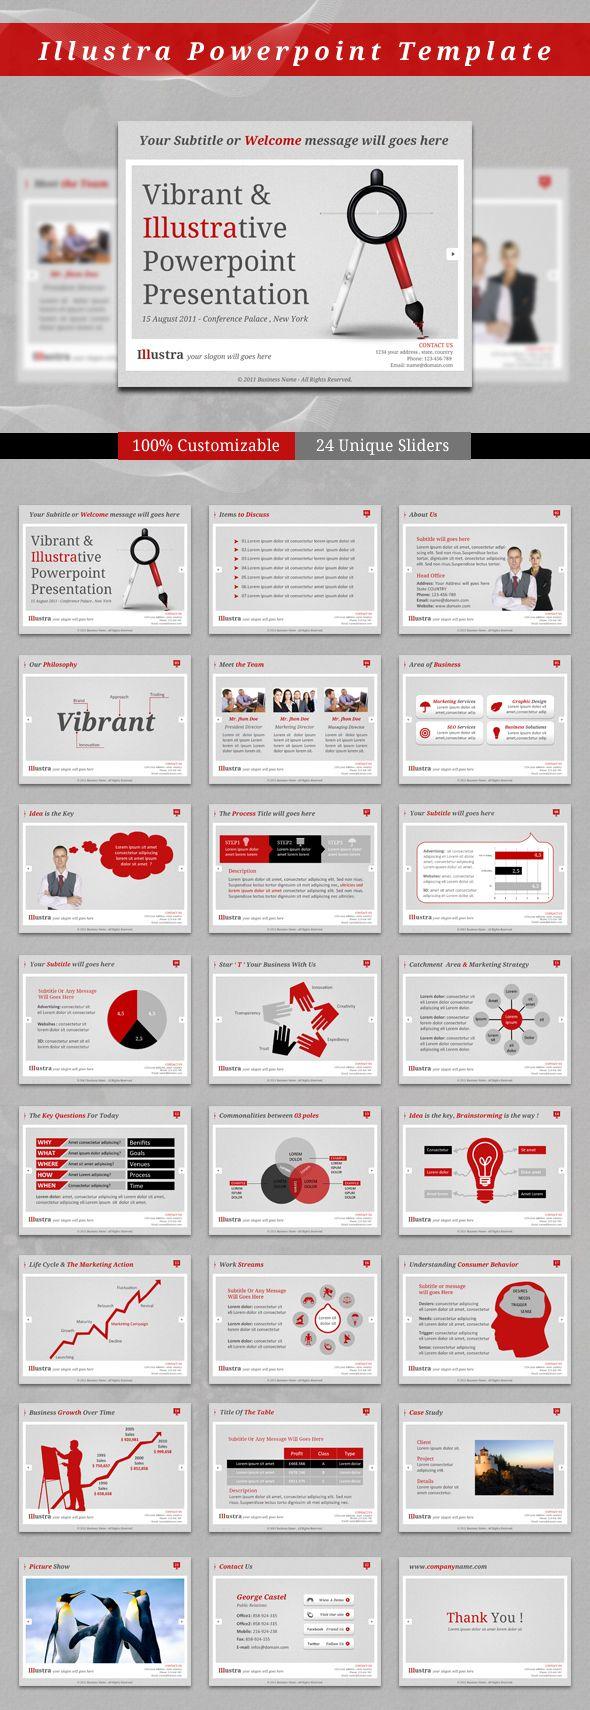 Illustra Powerpoint Template by kh2838.deviantart.com on @deviantART